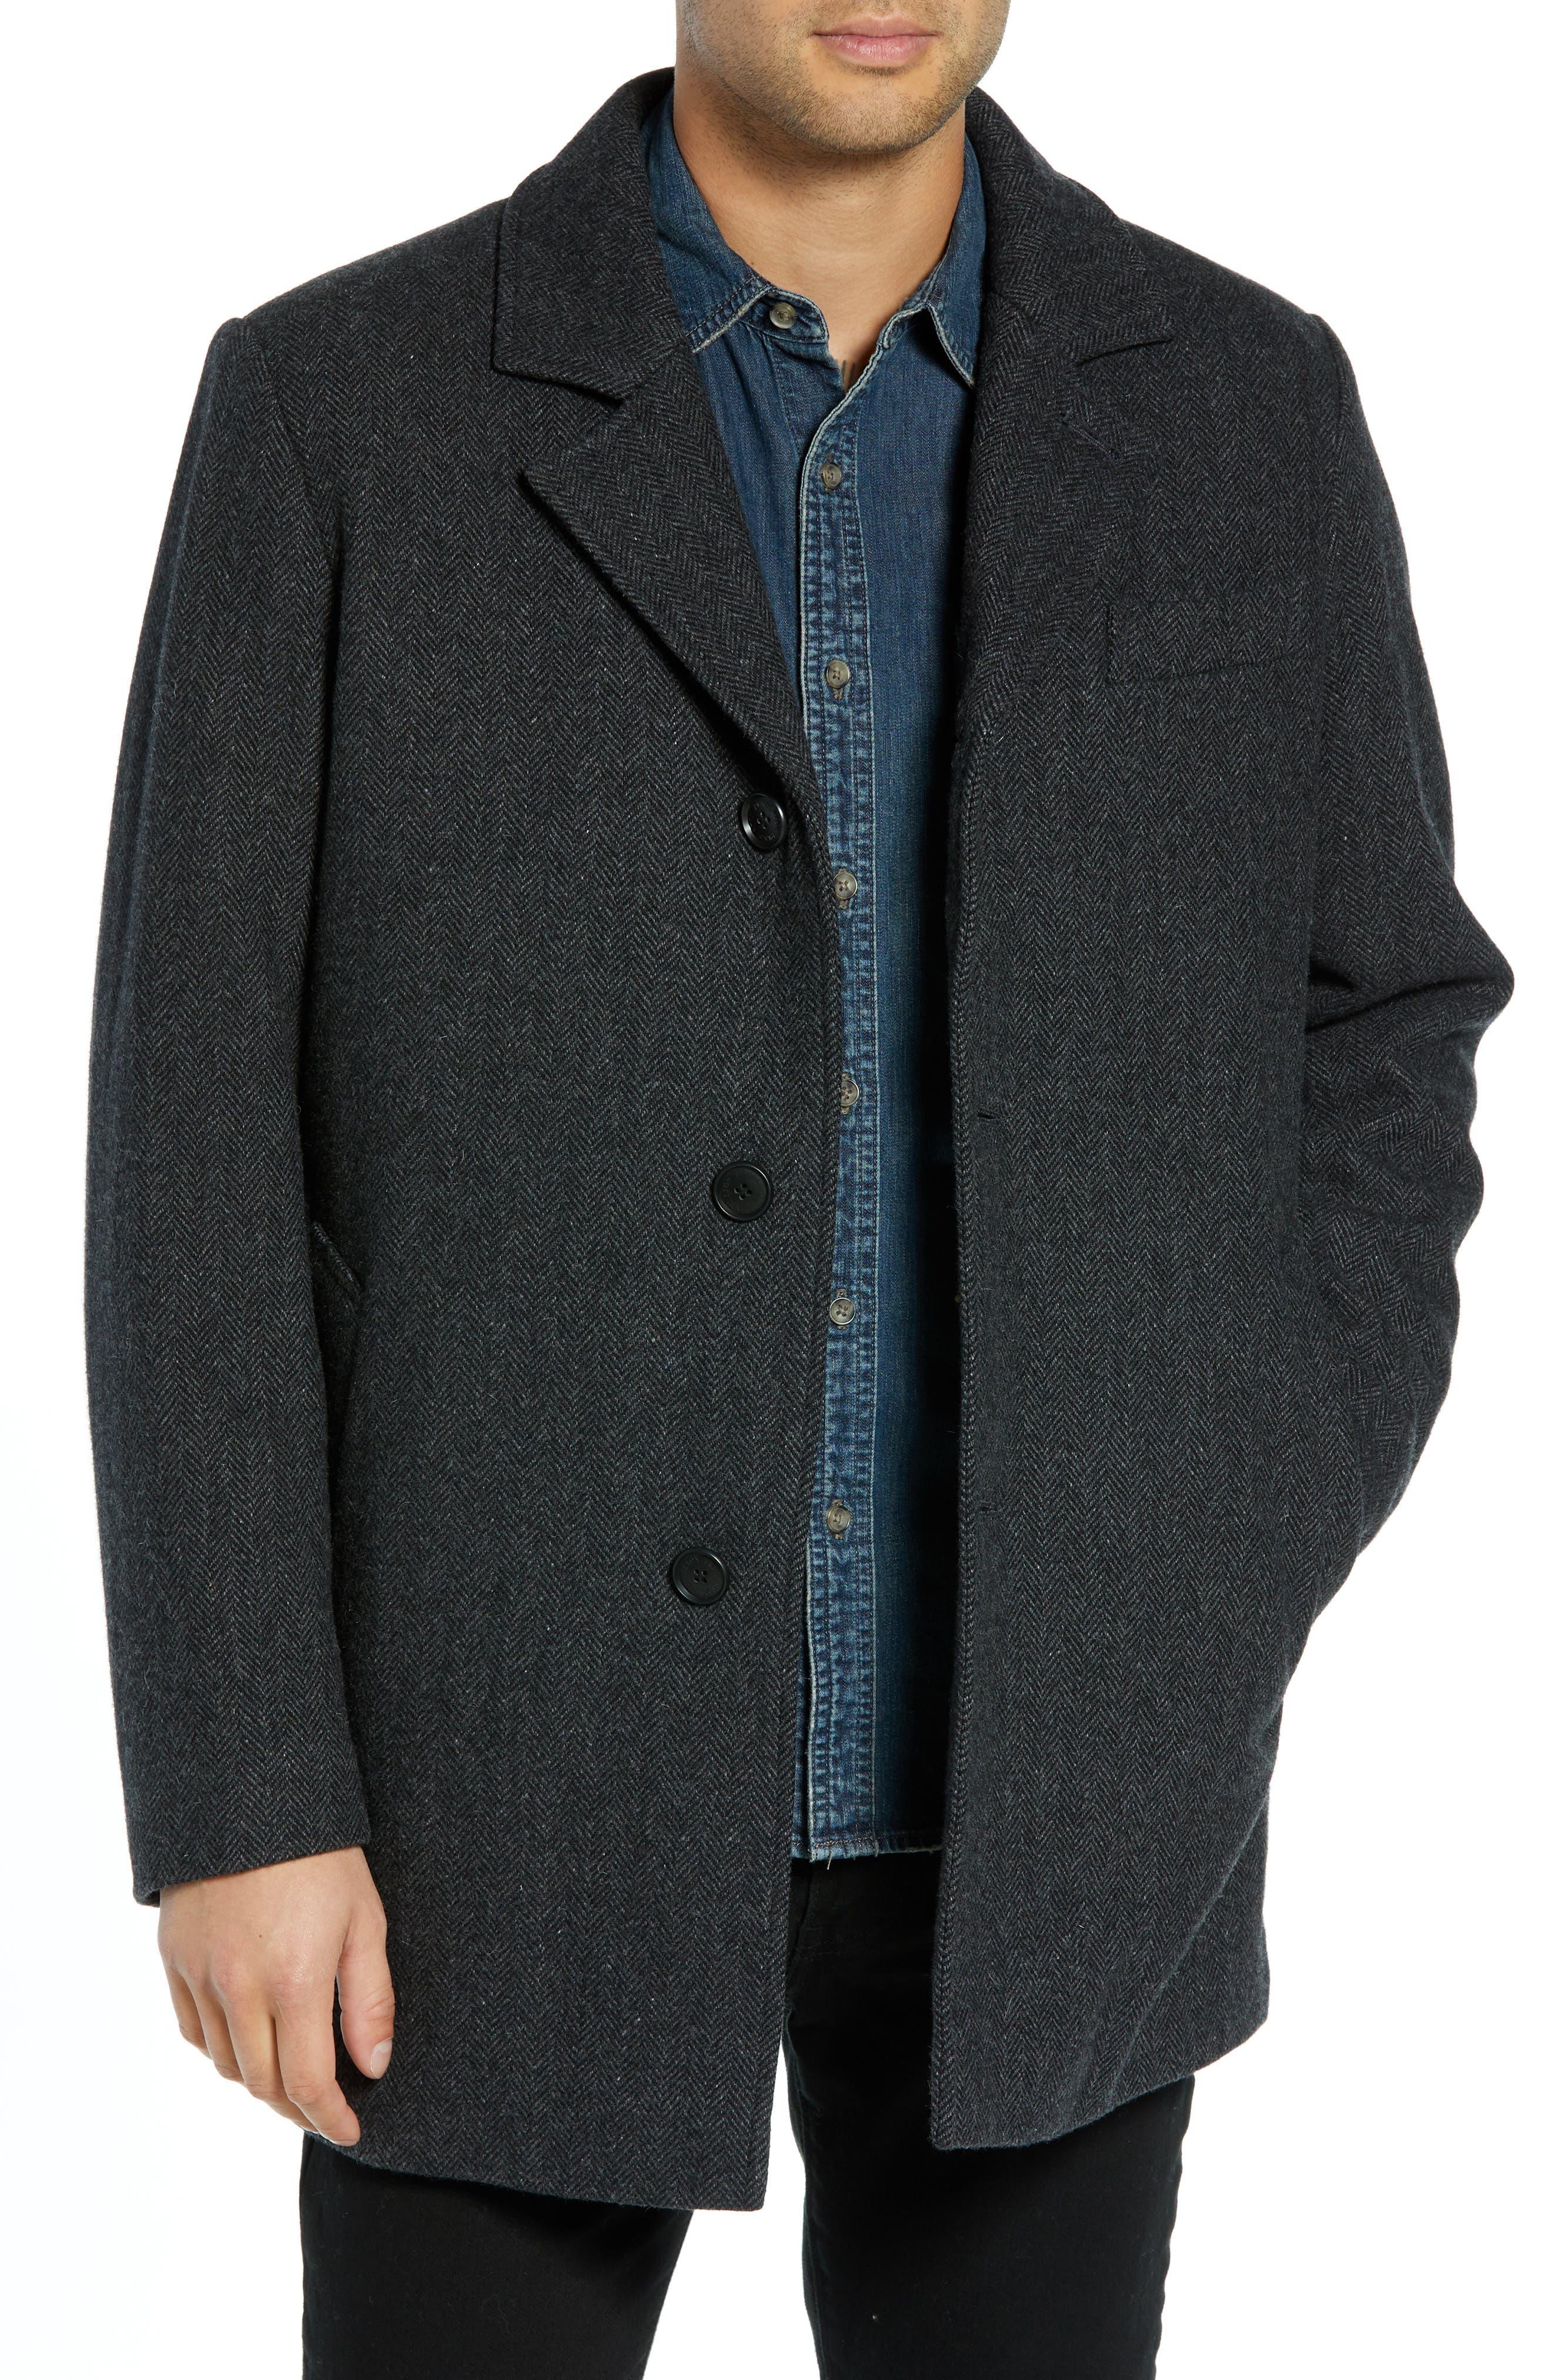 PENDLETON, Iconic Textures Manhattan Wool Blend Top Coat, Main thumbnail 1, color, CHARCOAL HERRINGBONE